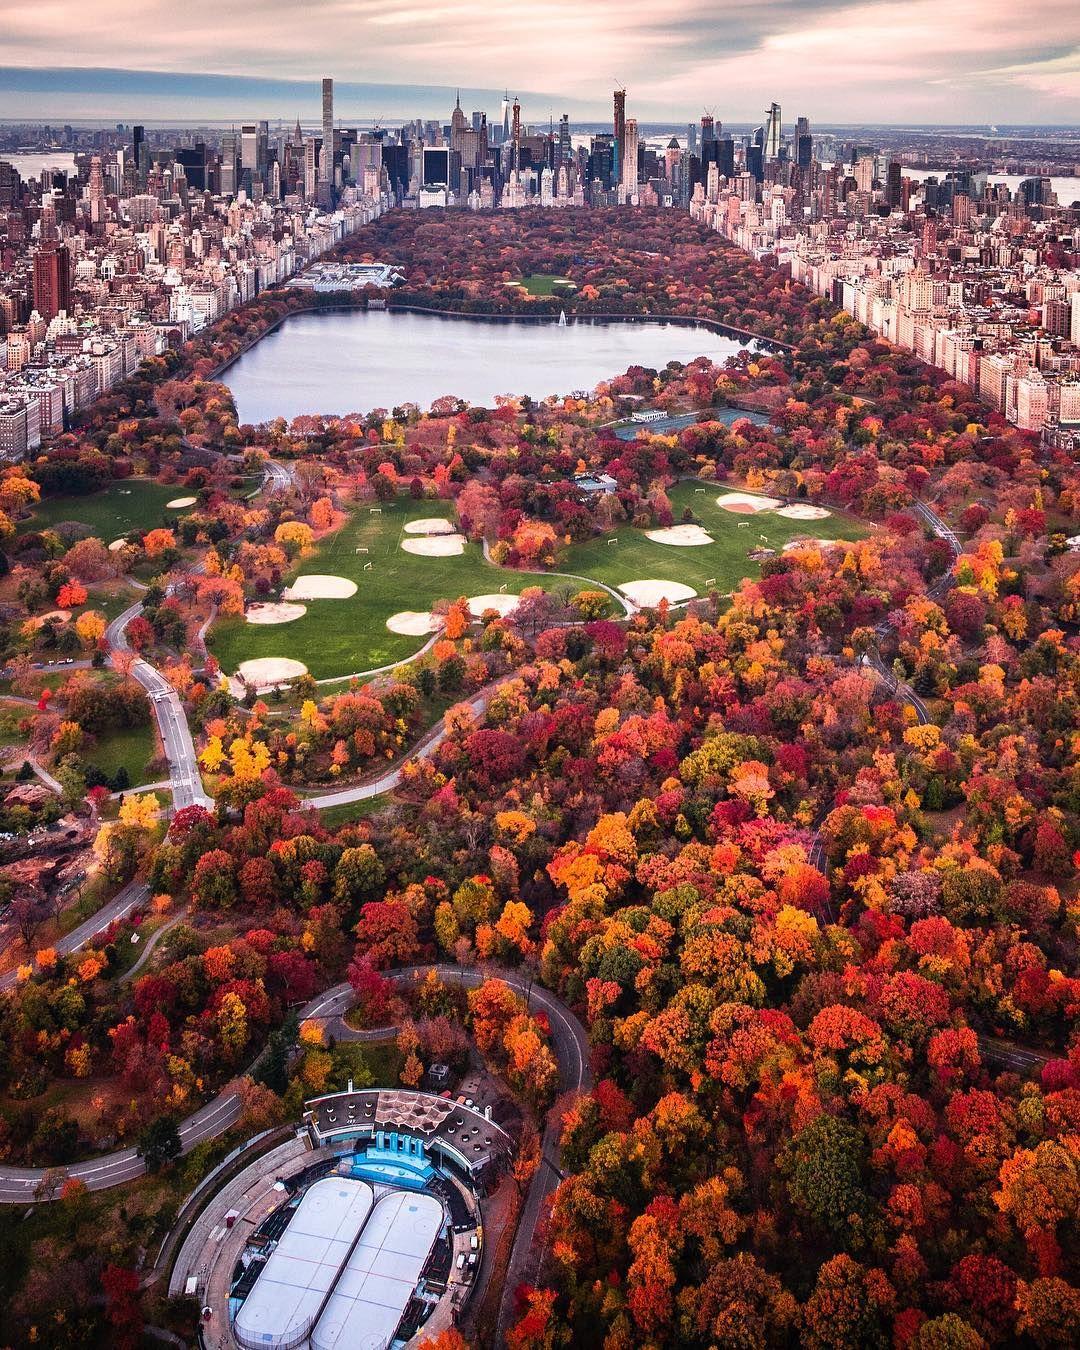 Central Park New York: Central Park New York [1080x1350]